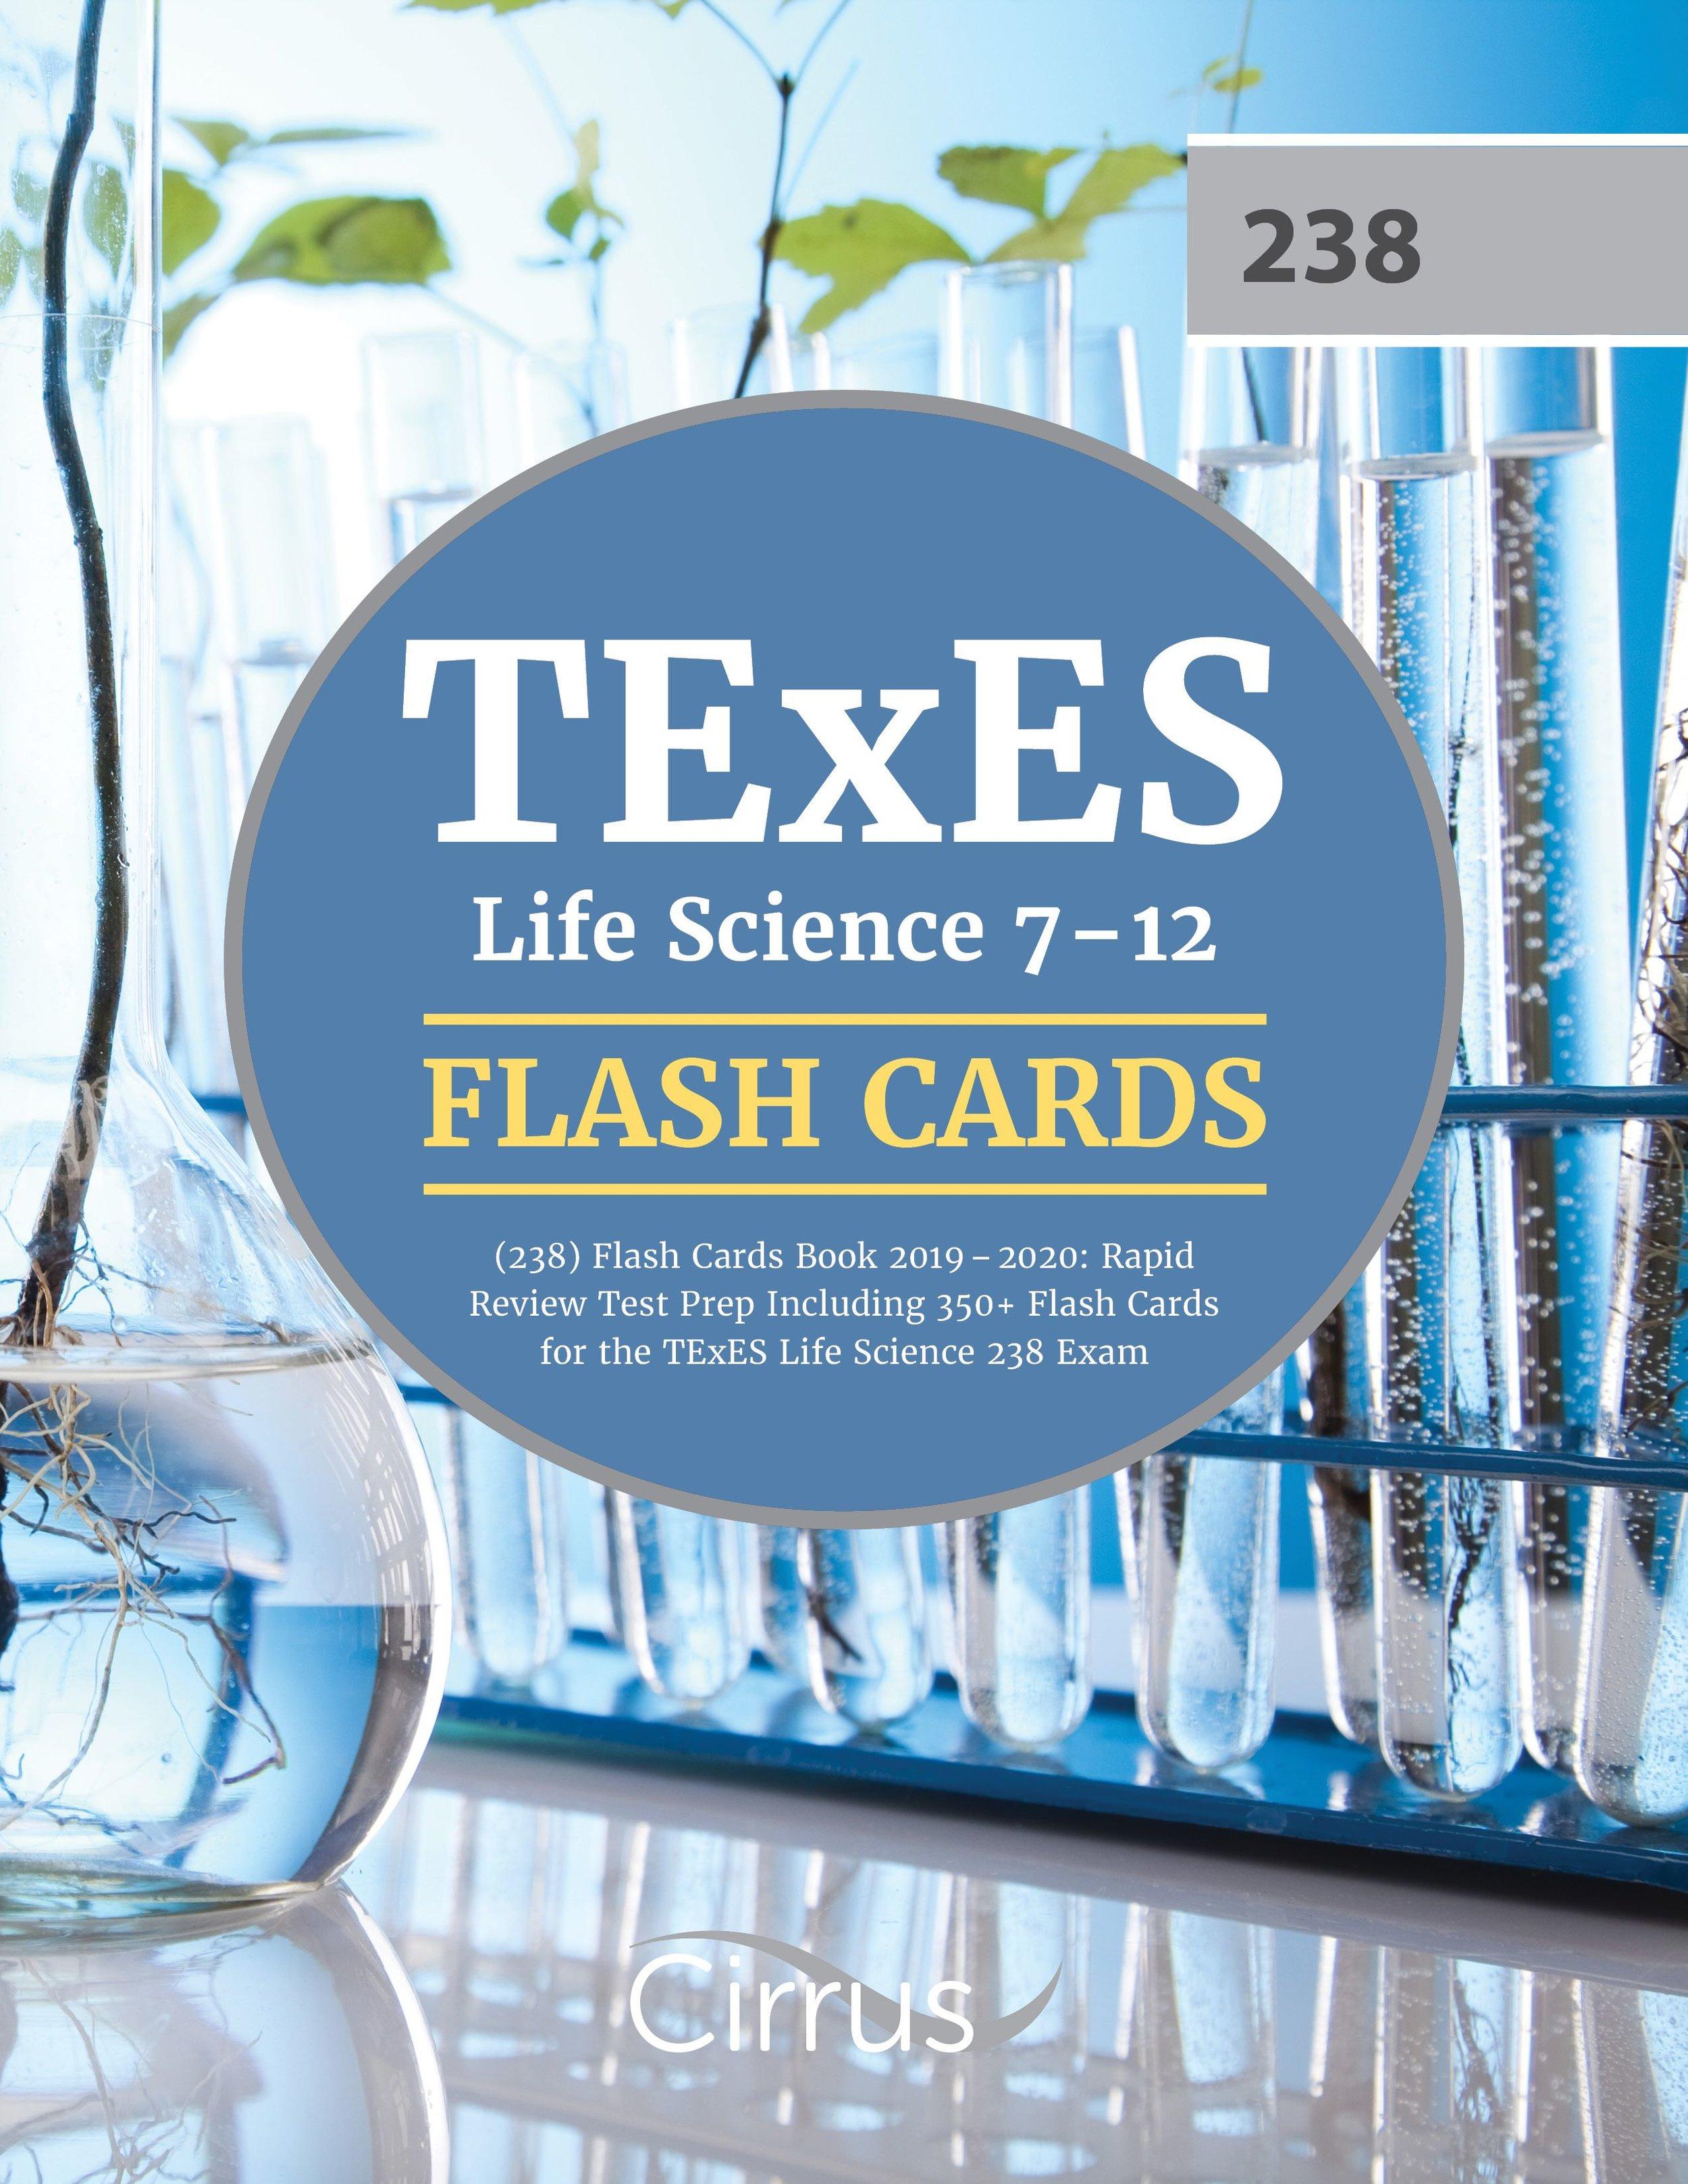 TExES_biology_cover_website-compressor.jpg